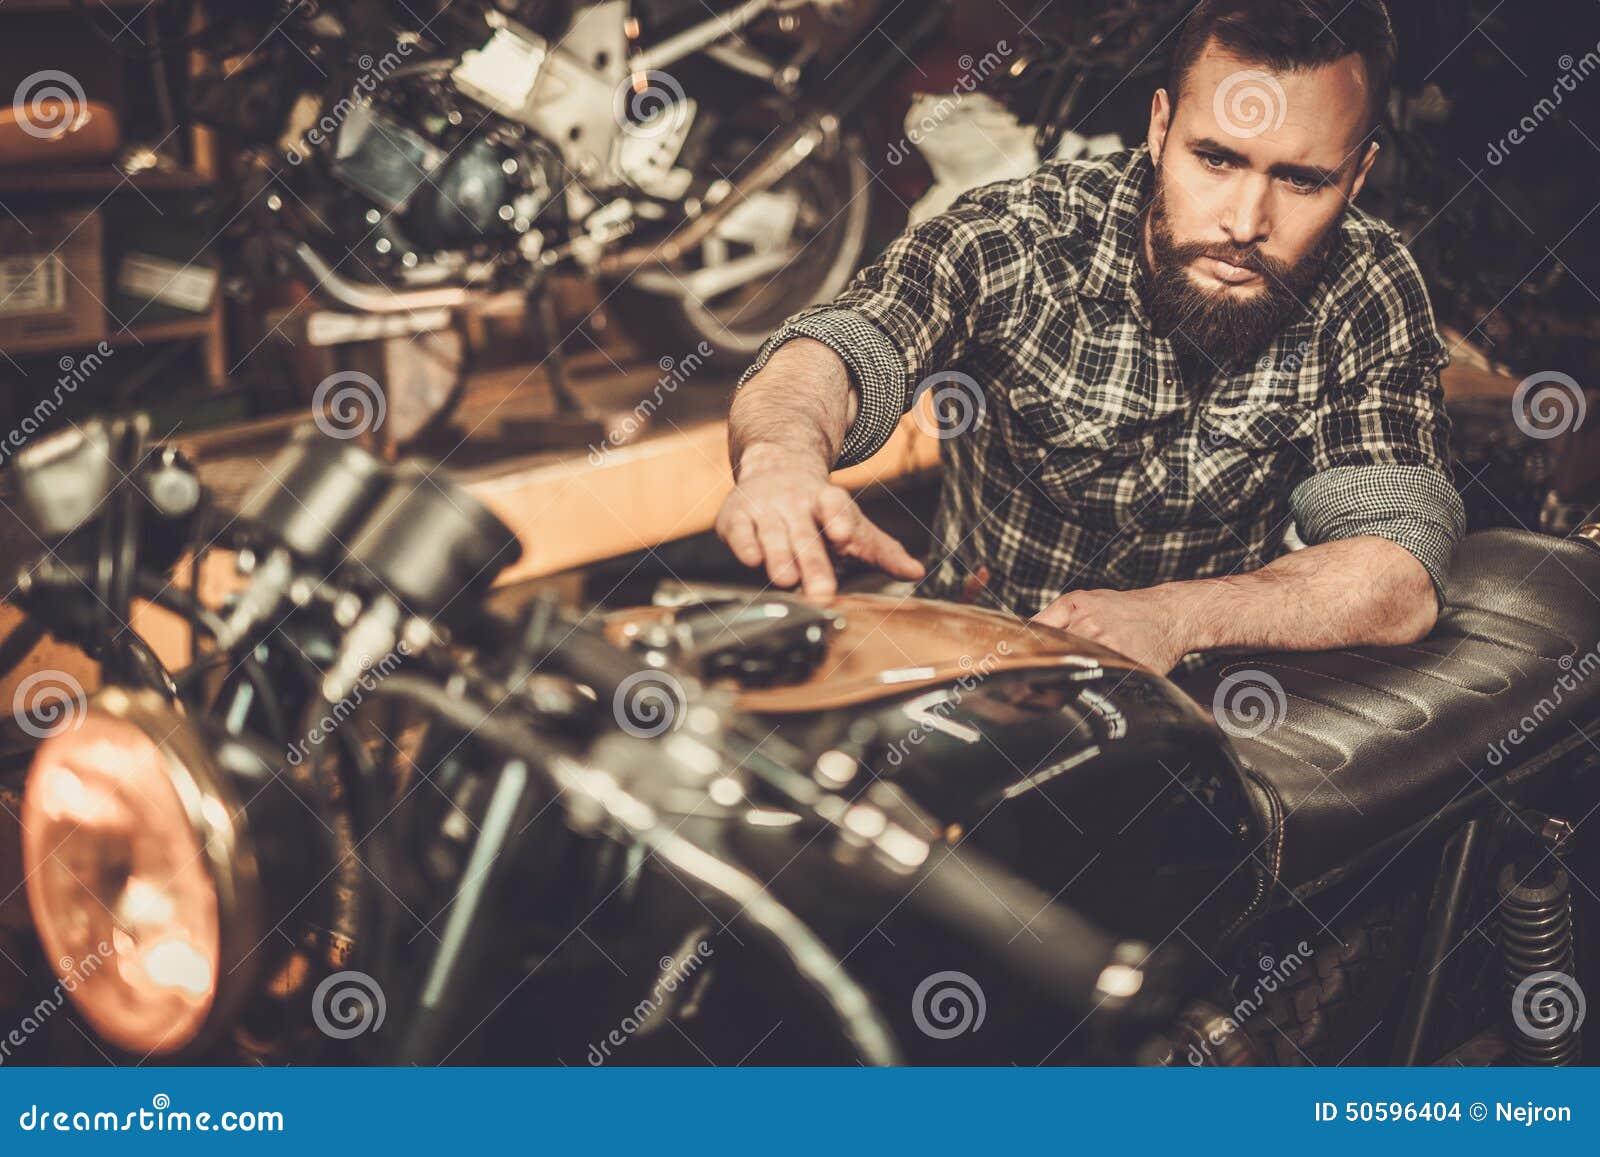 Mechanic building vintage style cafe-racer